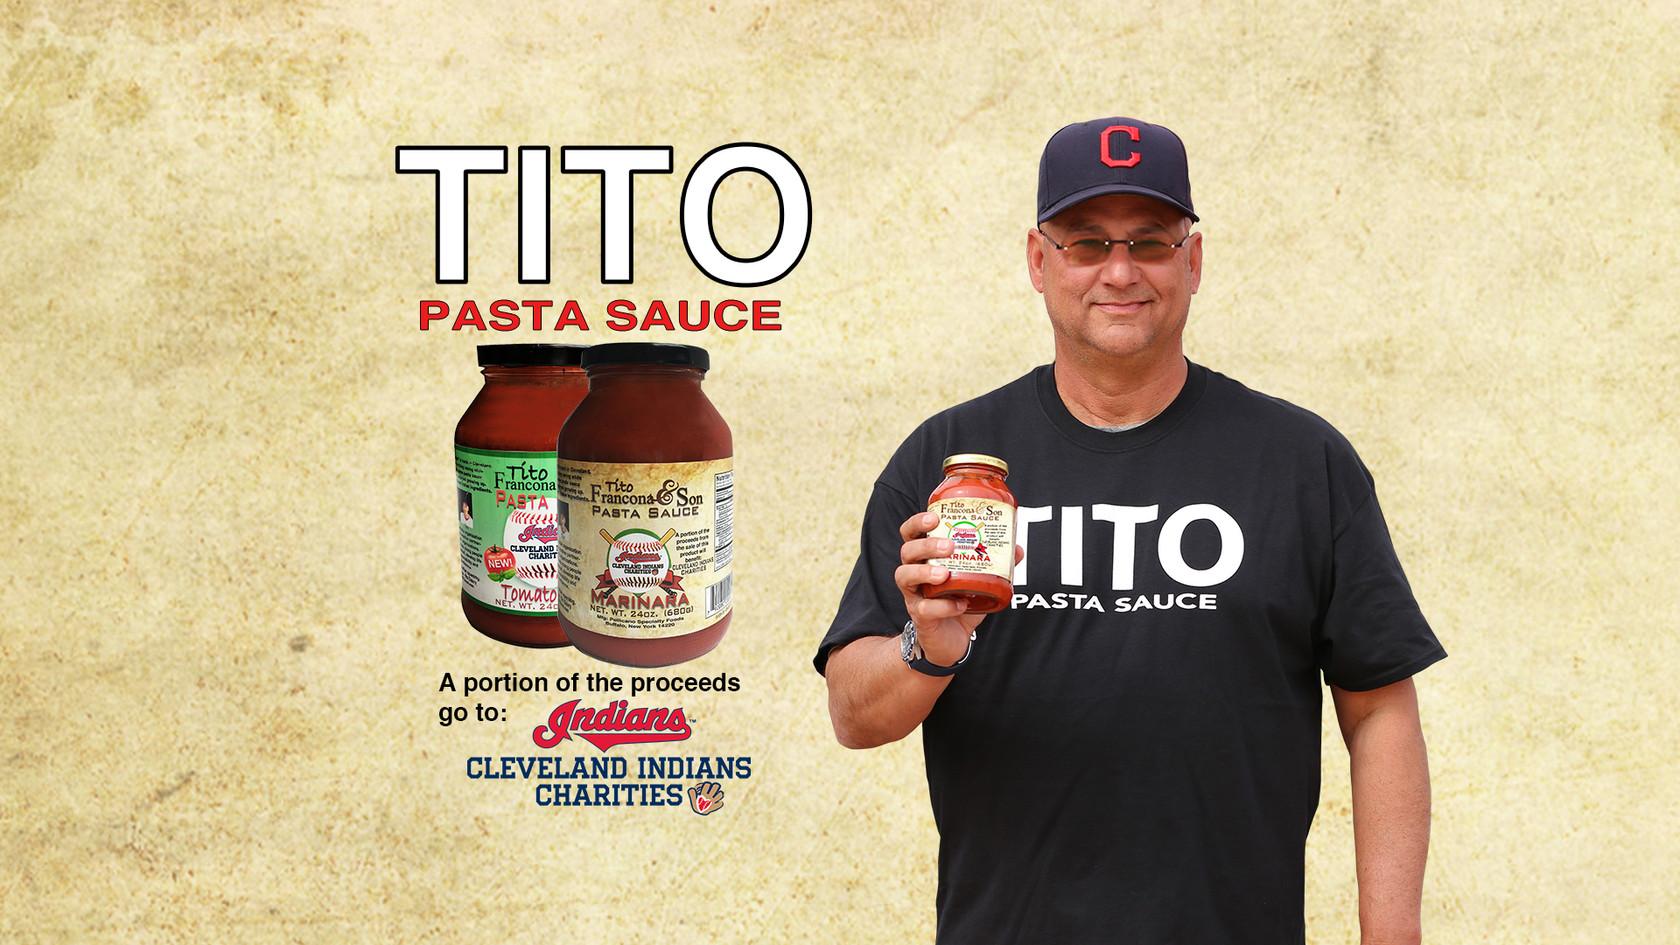 Tito Francona & Son Pasta Sauce